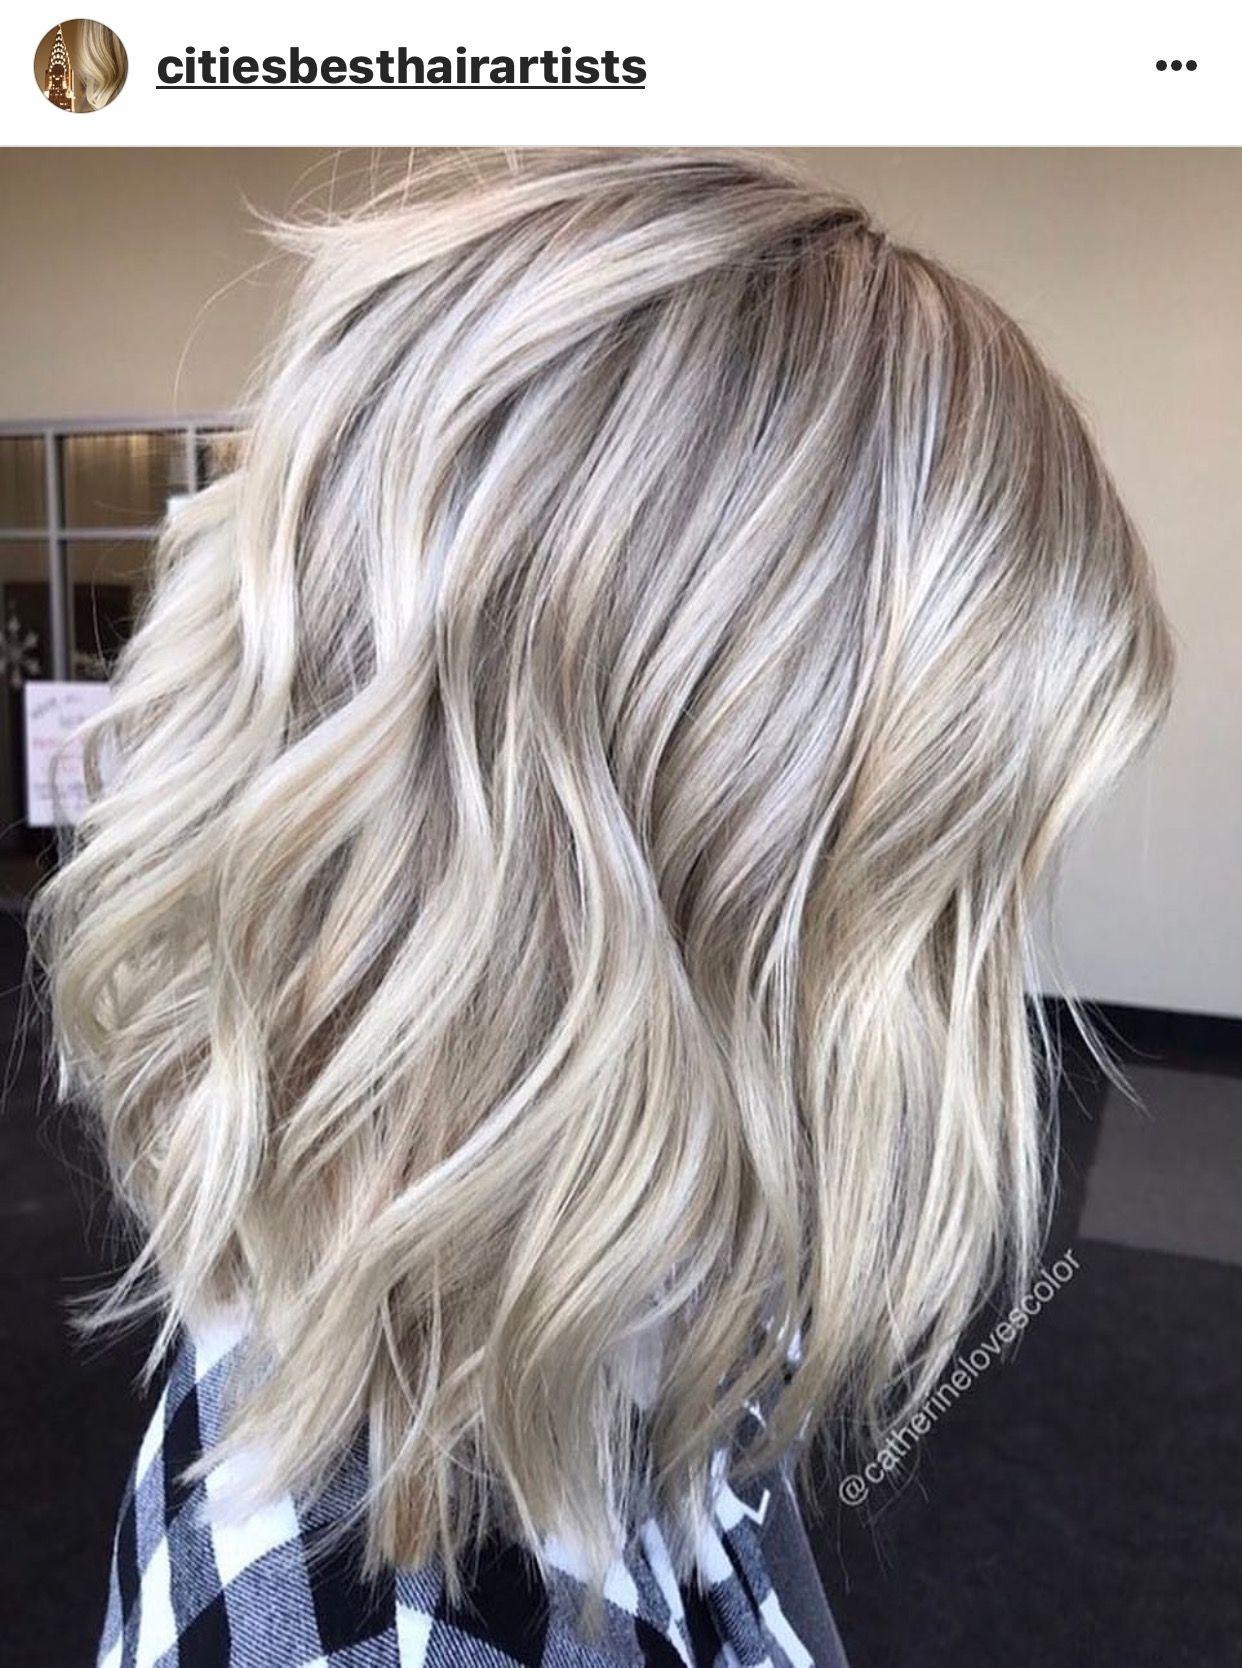 Pin by alexandra gabrielle on professional attire pinterest hair